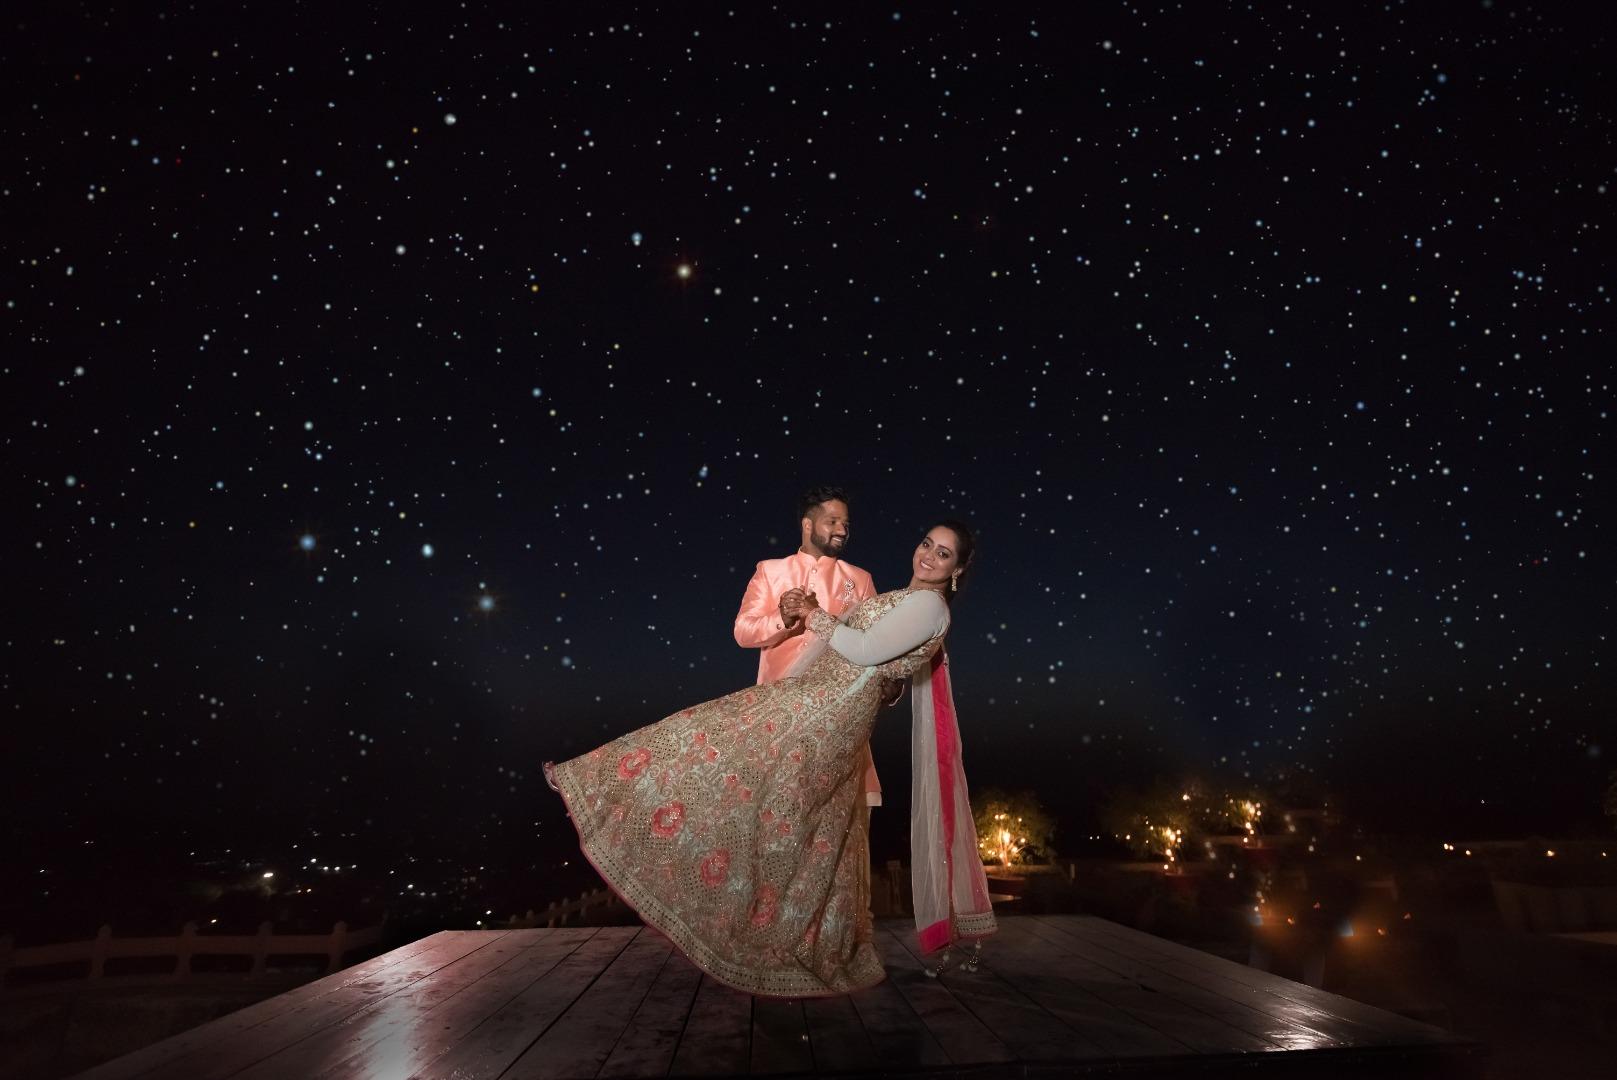 Pre-Wedding Shoot on a Starry Night